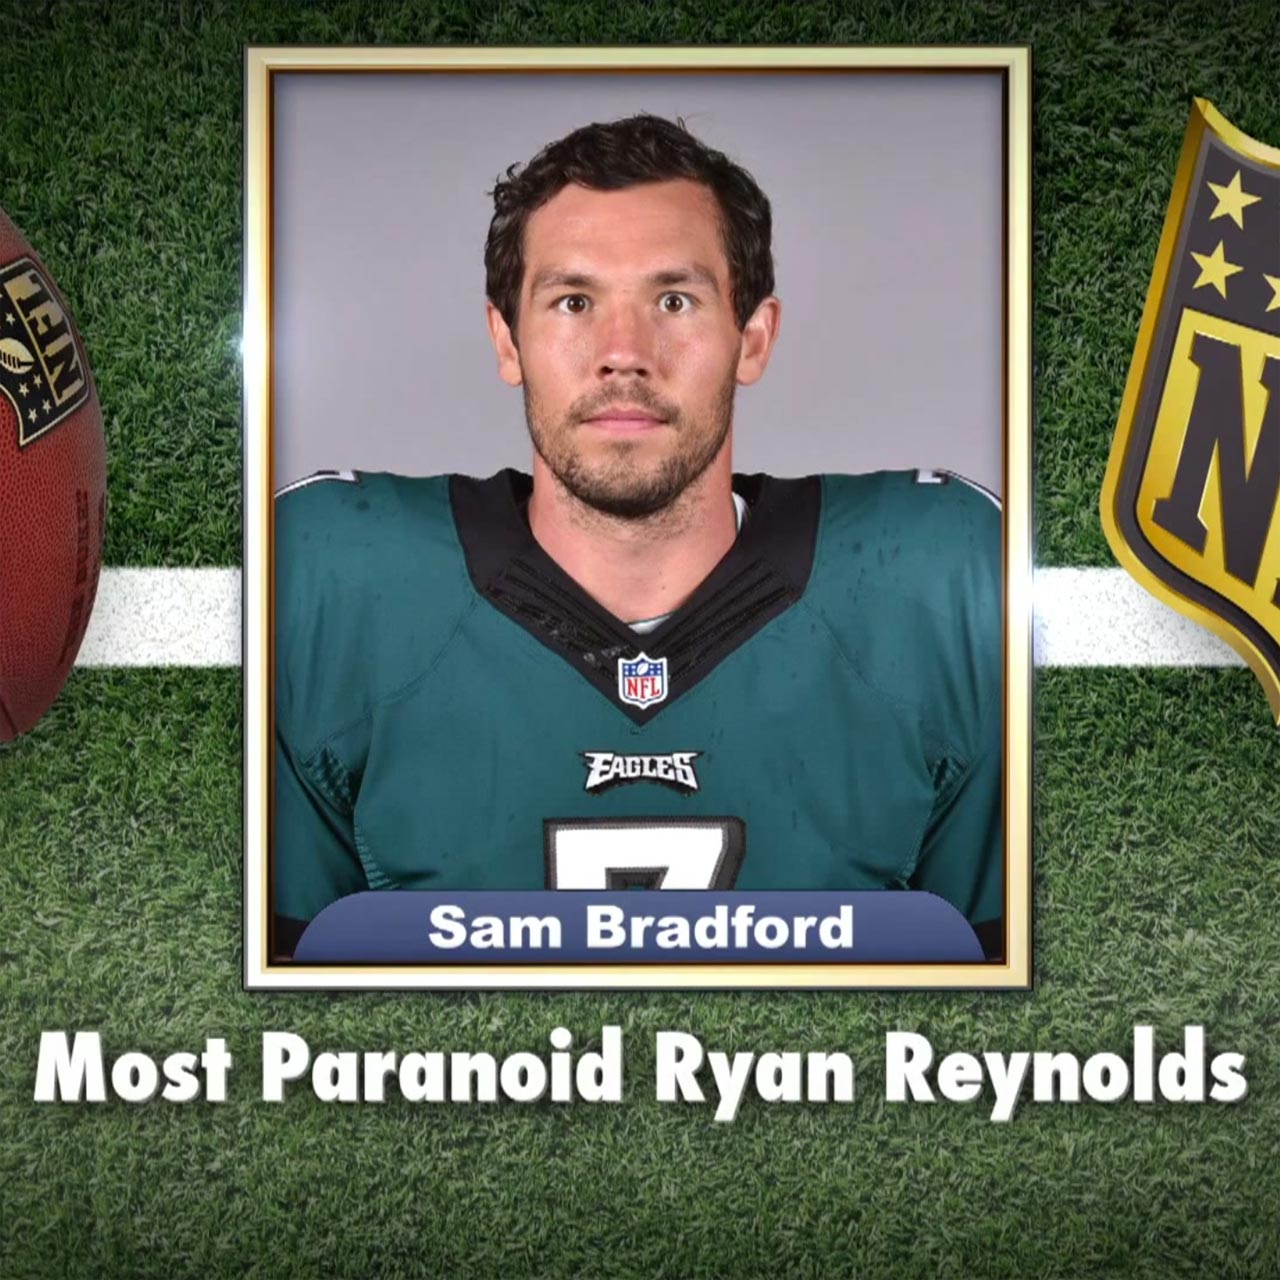 Eagles quarterback Sam Bradford is the Most Paranoid Ryan Reynolds